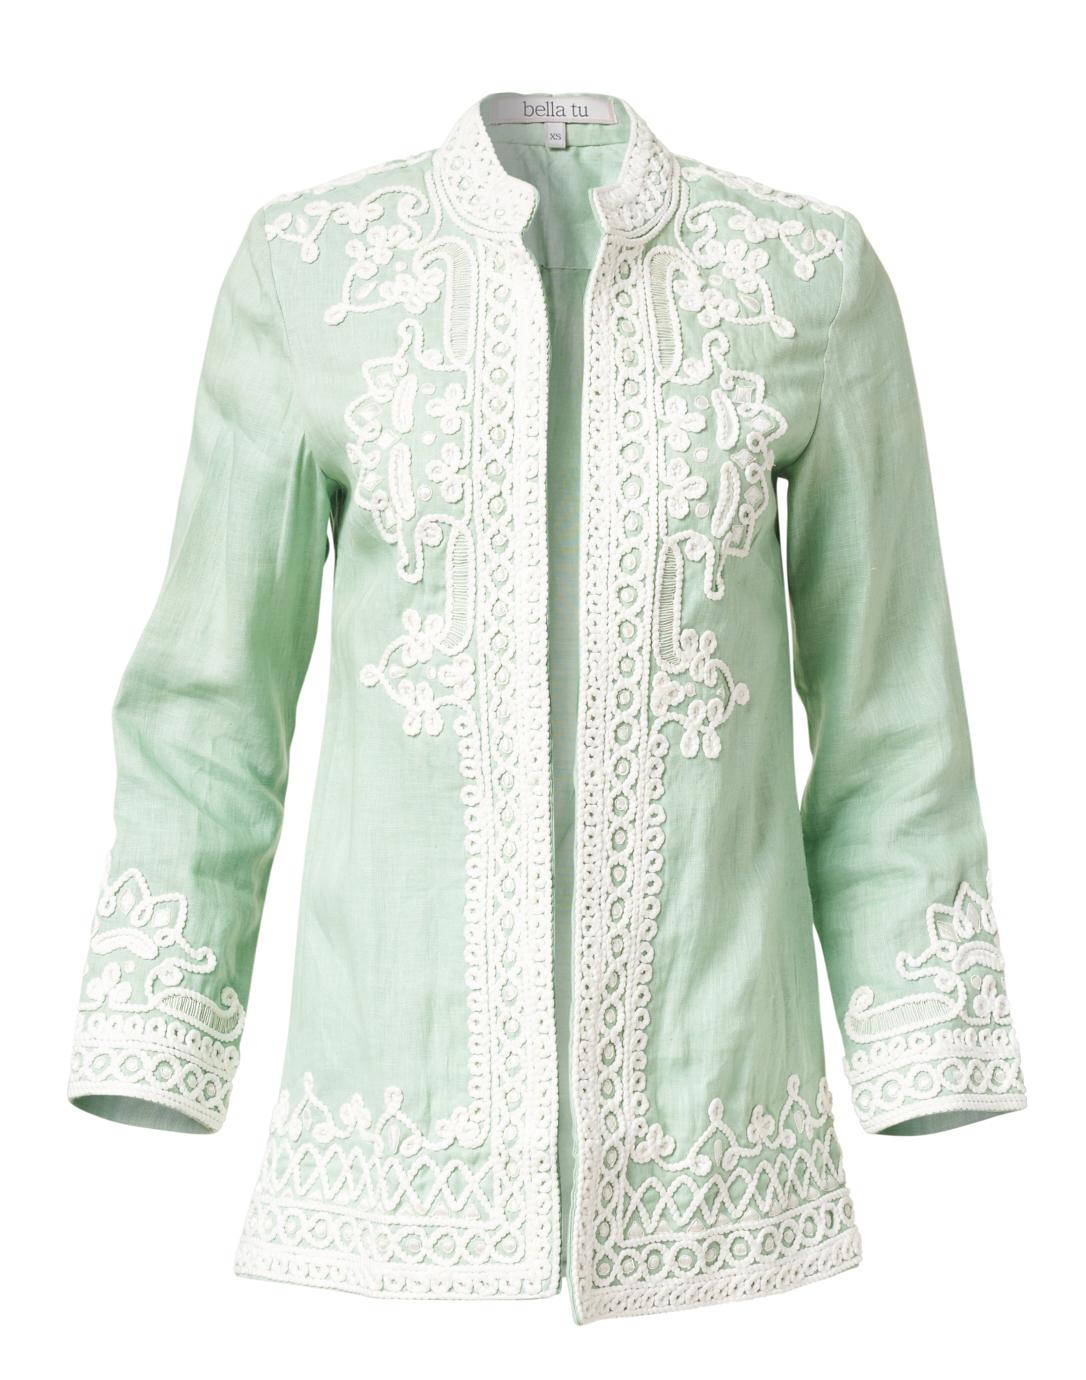 Tailored Embroider Color olive Regular fit INC Women Capri new 100/% Linen